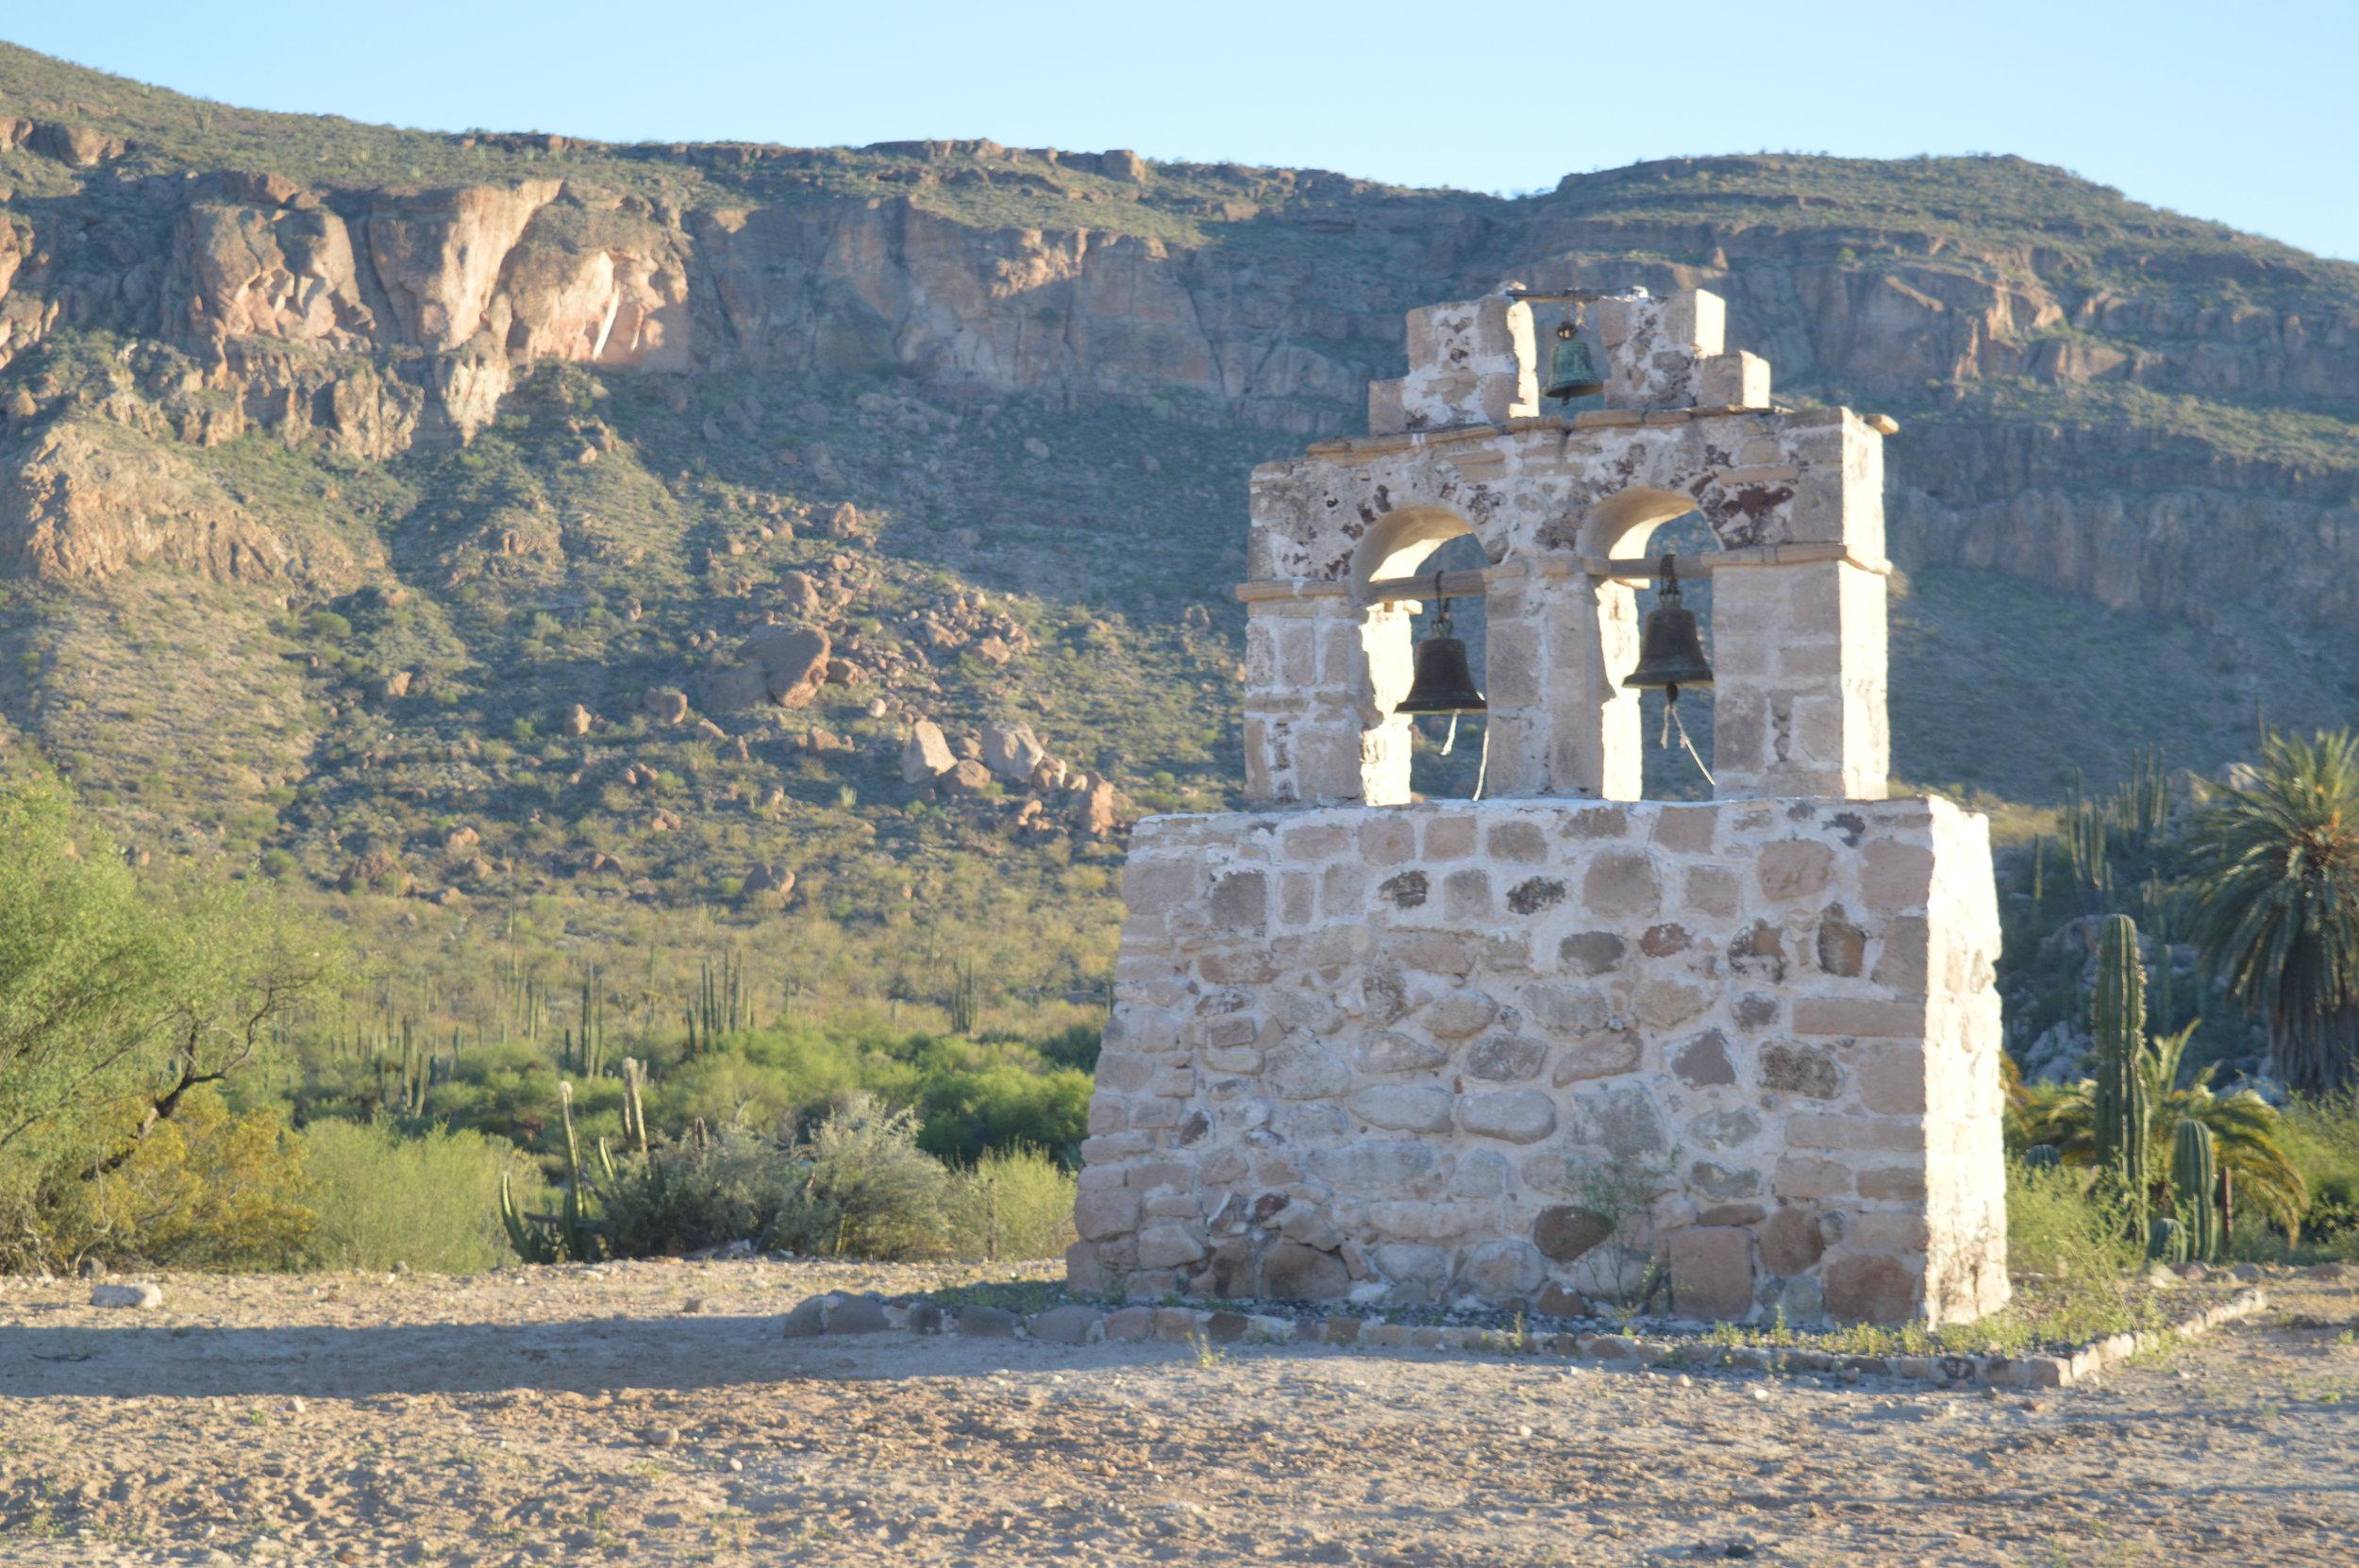 The bell tower at Santa Gertrudis Mission